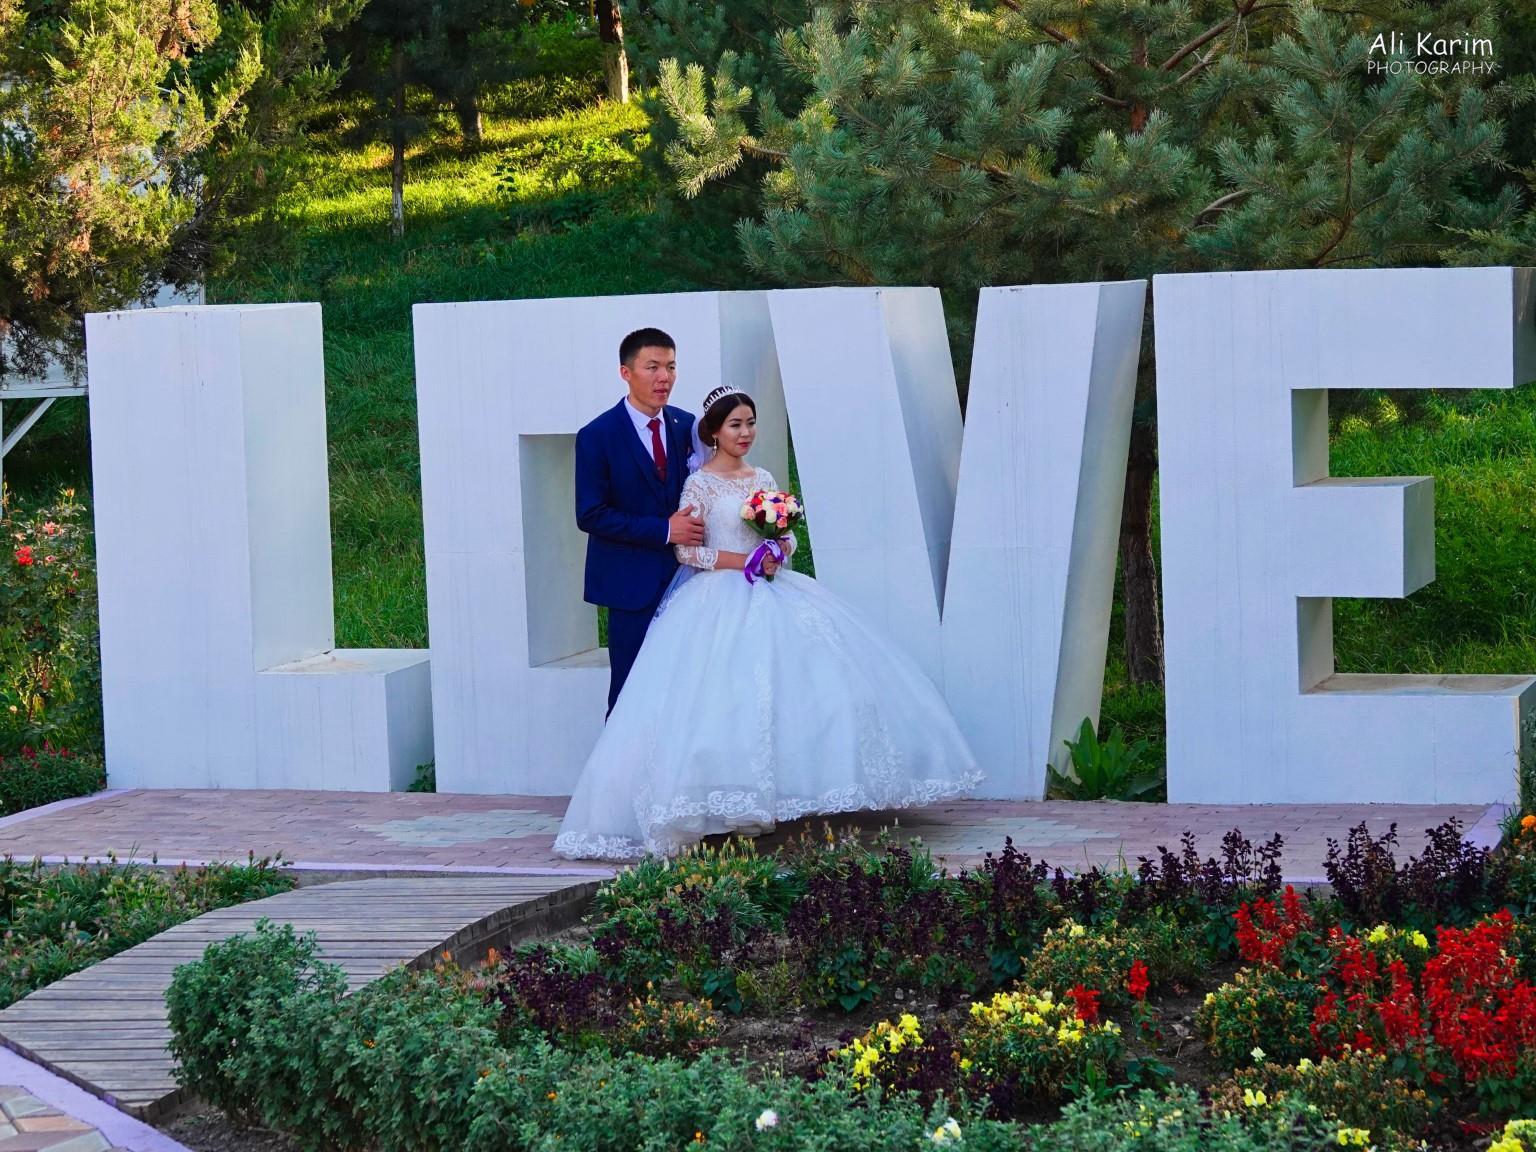 Silk Road 15: Osh, Kyrgyzstan Another wedding couple